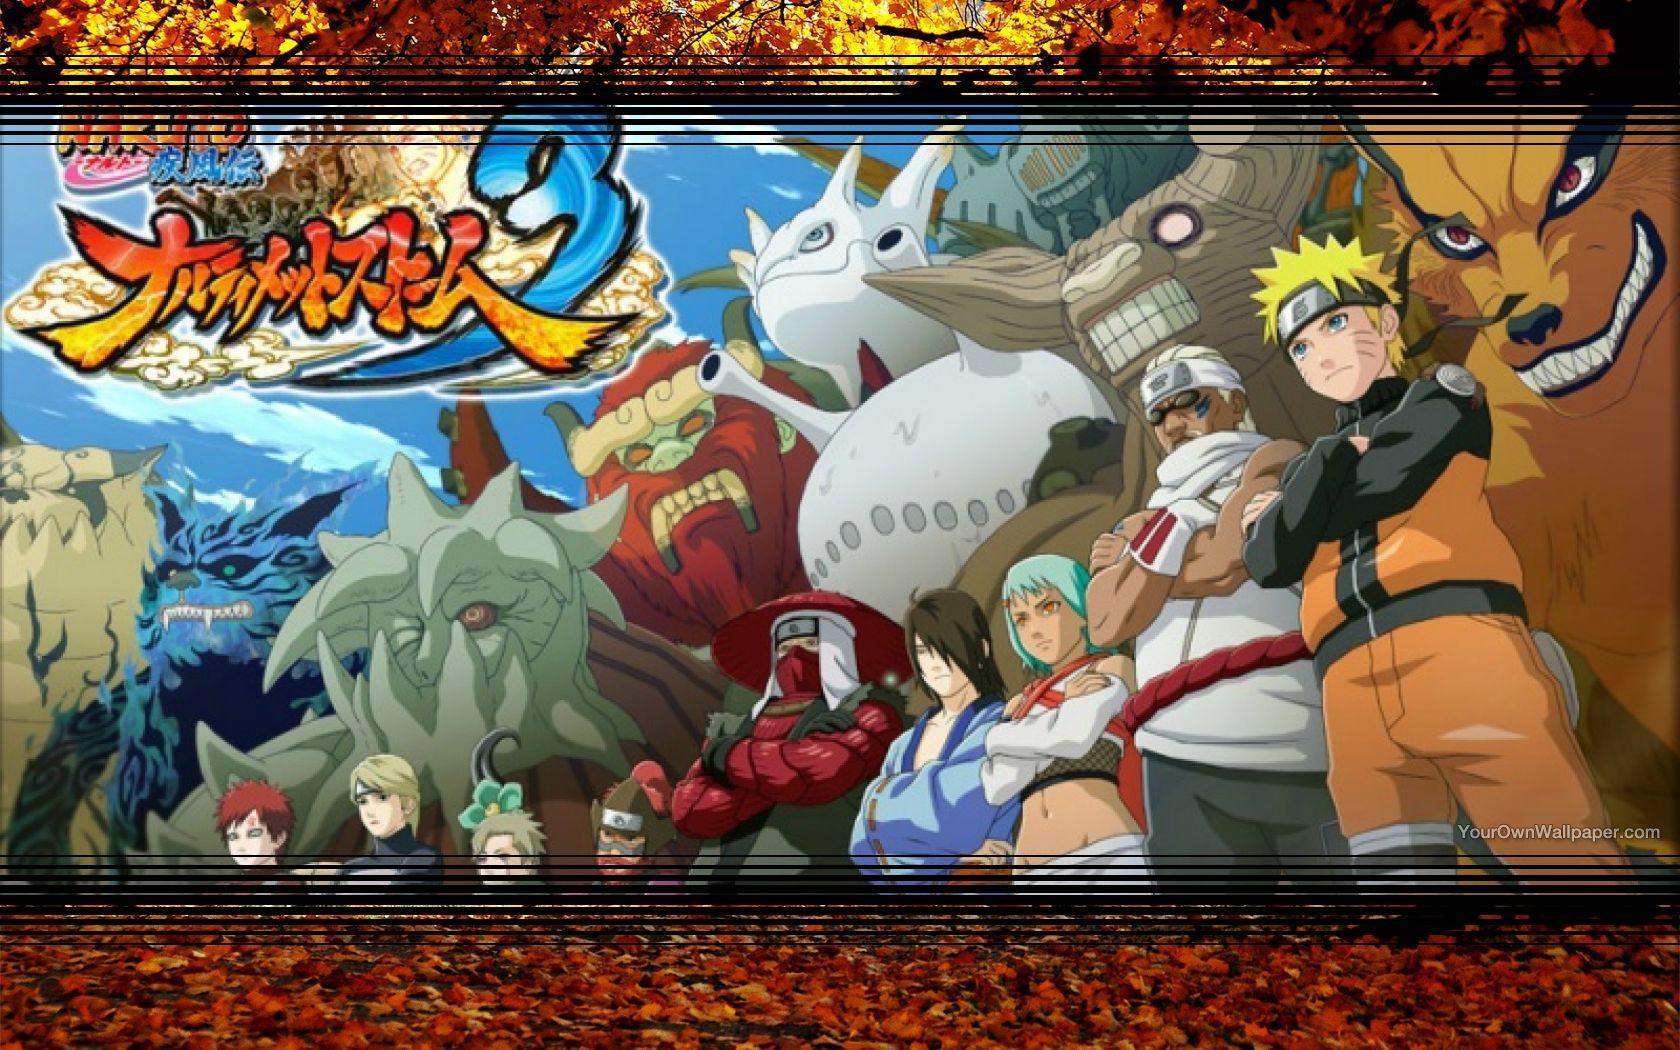 Cool Wallpaper Naruto Art - naruto_bijuu_and_jinchuuriki_wallpaper_by_weissdrum-d5vpual  Pictures_518186.jpg